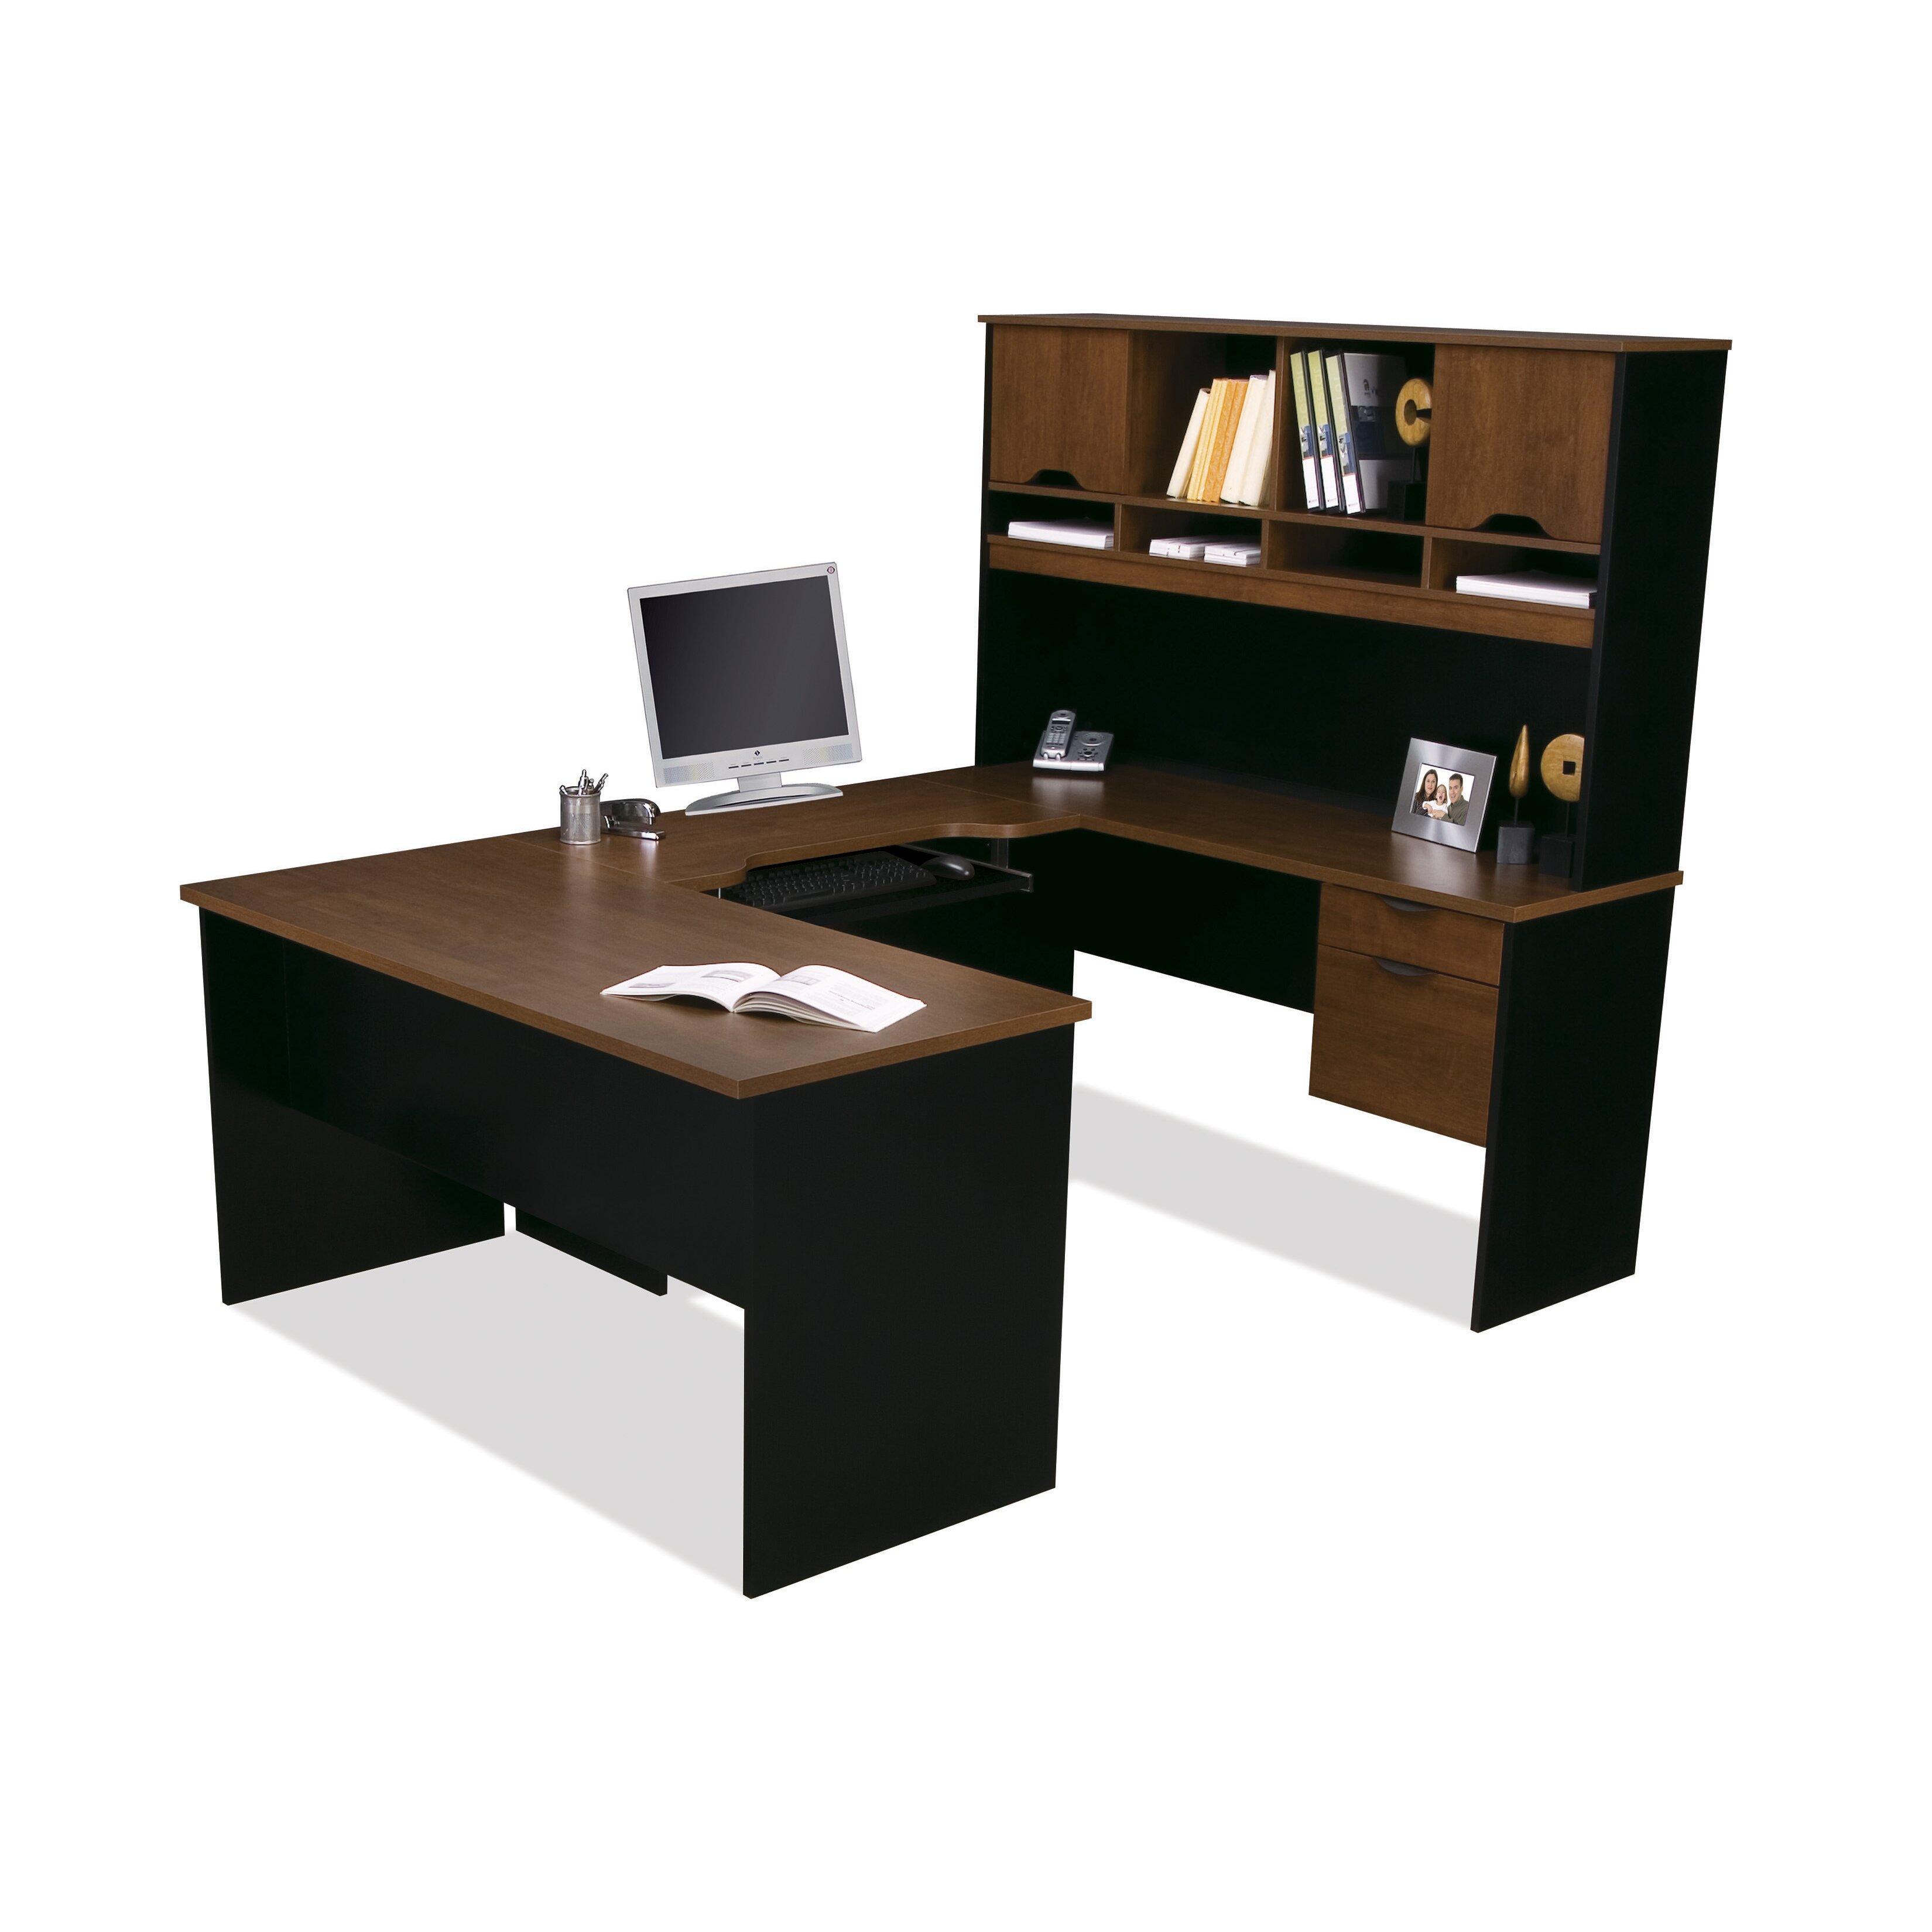 Bestar Innova Executive Desk  Wayfair. 7ft Slate Pool Table. Mini Desk Lamp. Expandable Desk Drawer Organizer. Hotel Front Desk Attire